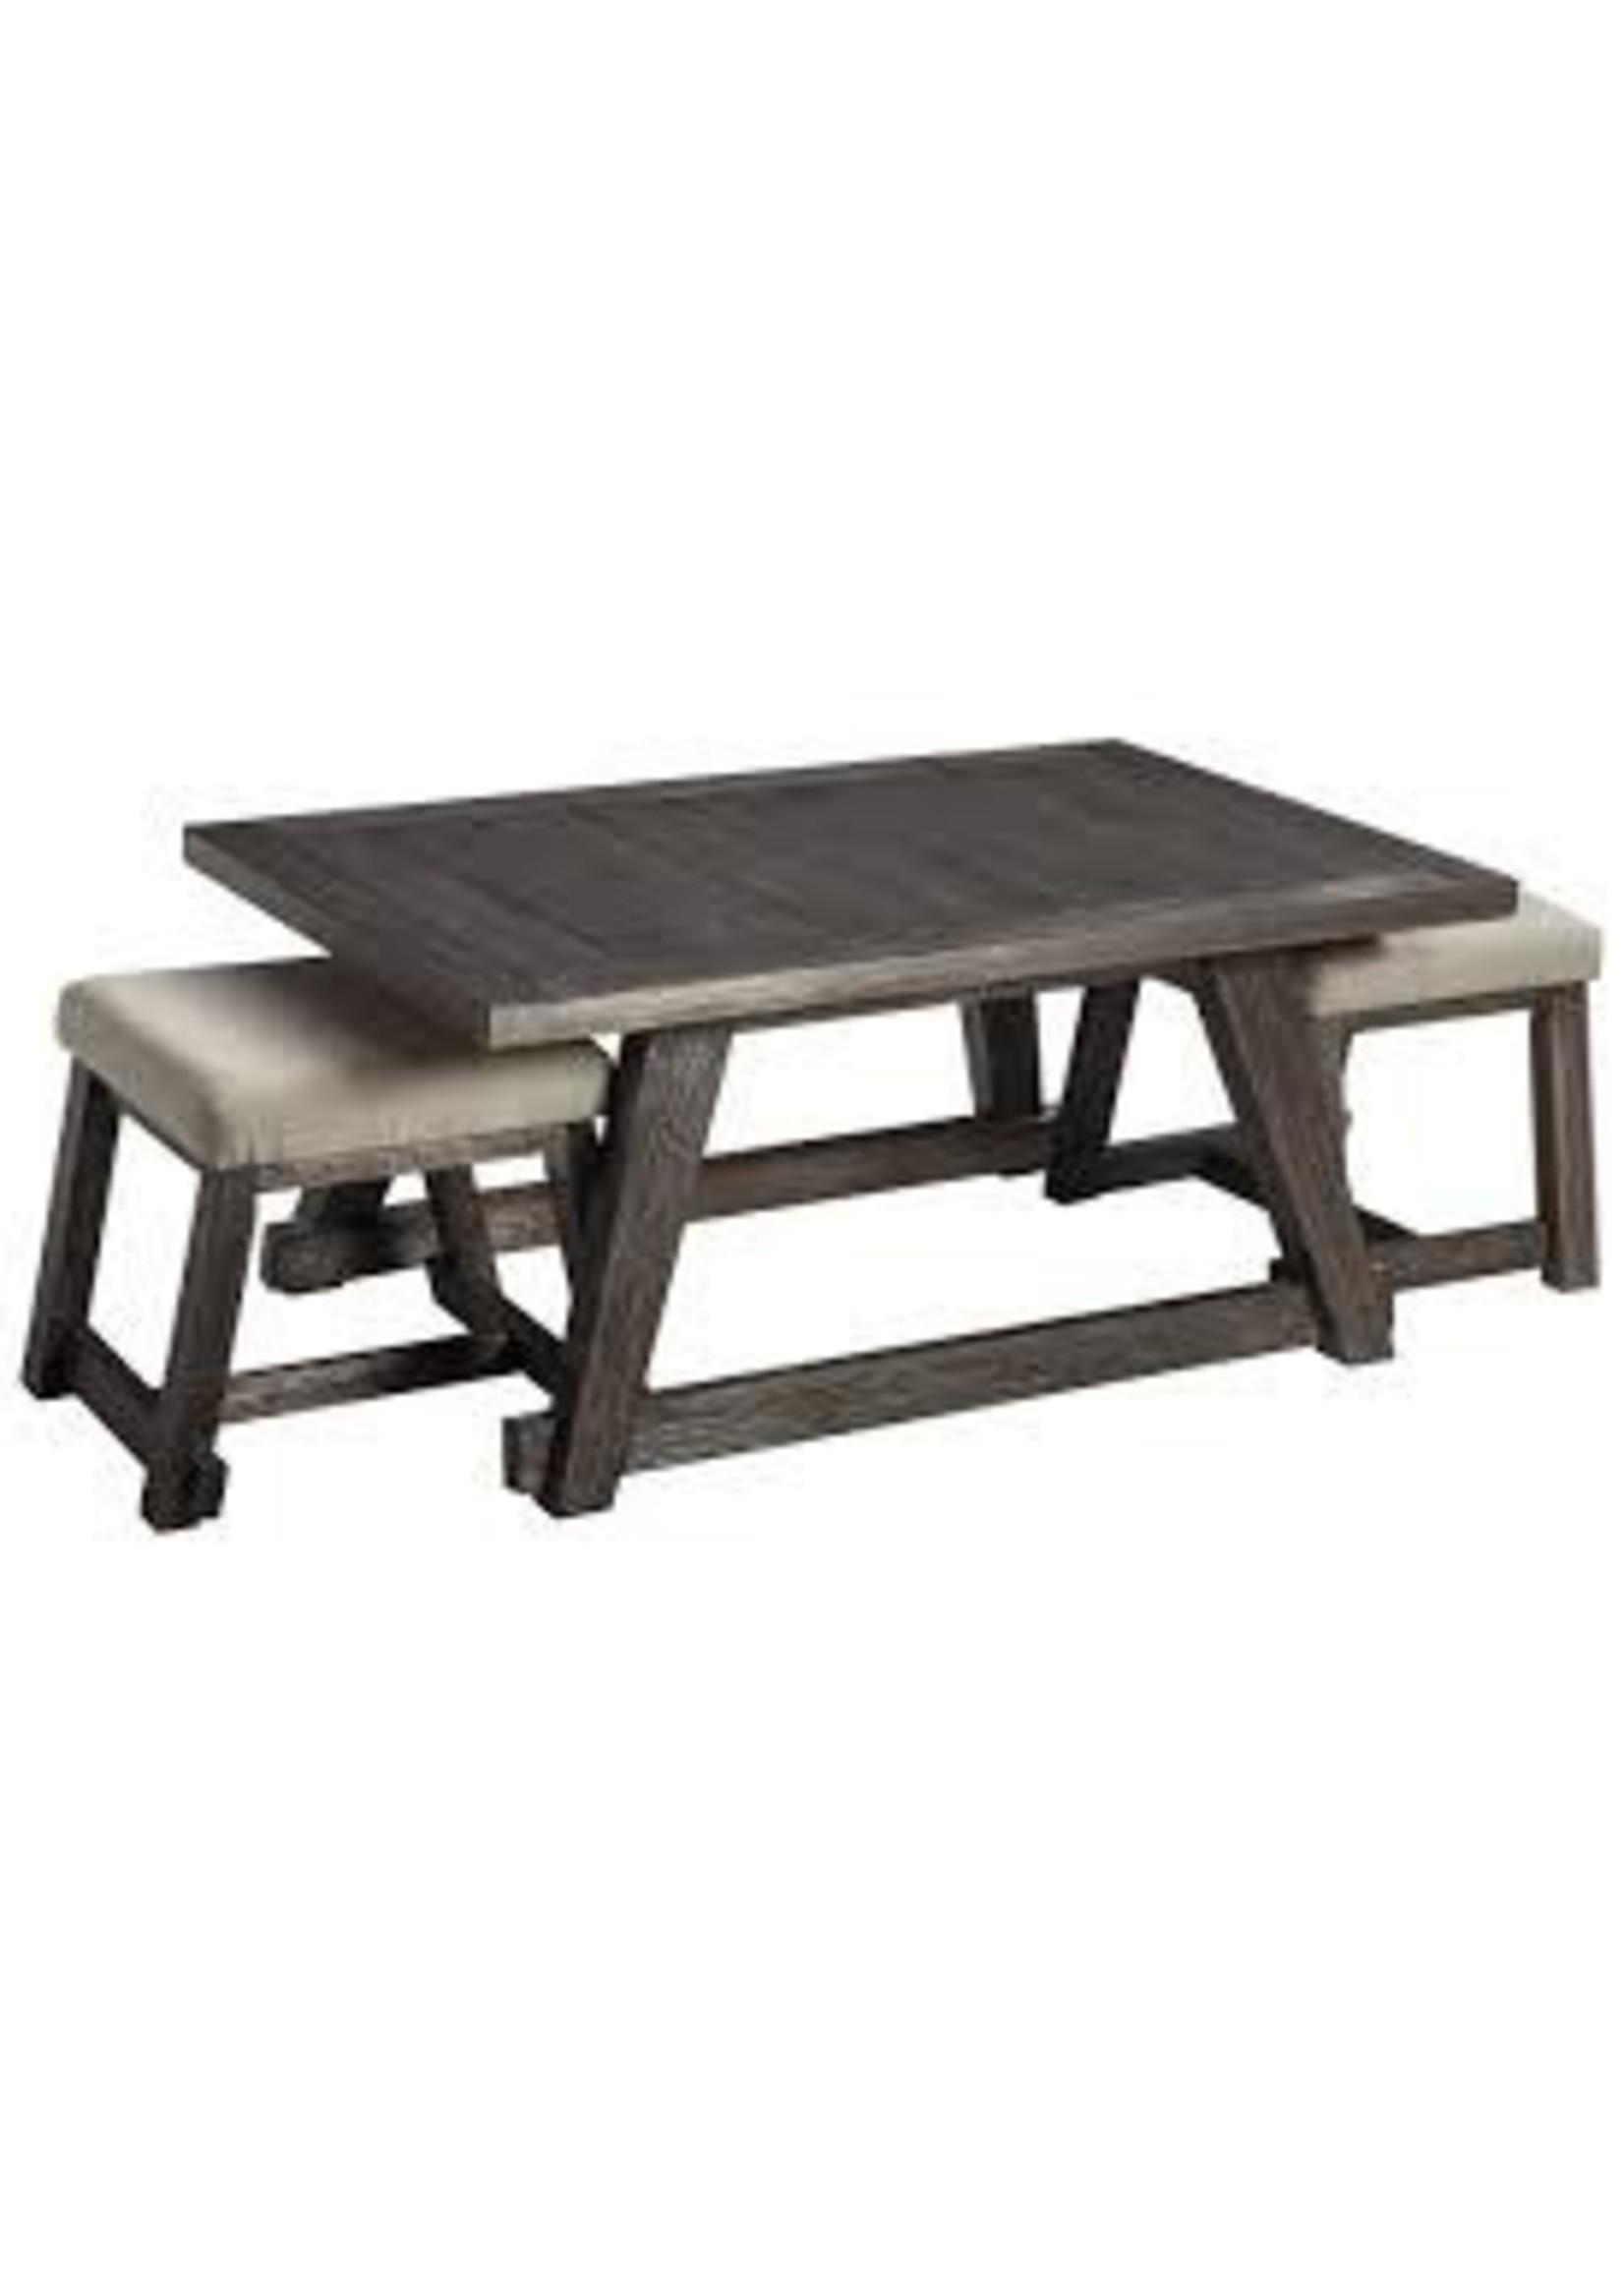 ASHLEY T426-1 COCKTAIL TABLE W/2 STOOLS HARPOLI